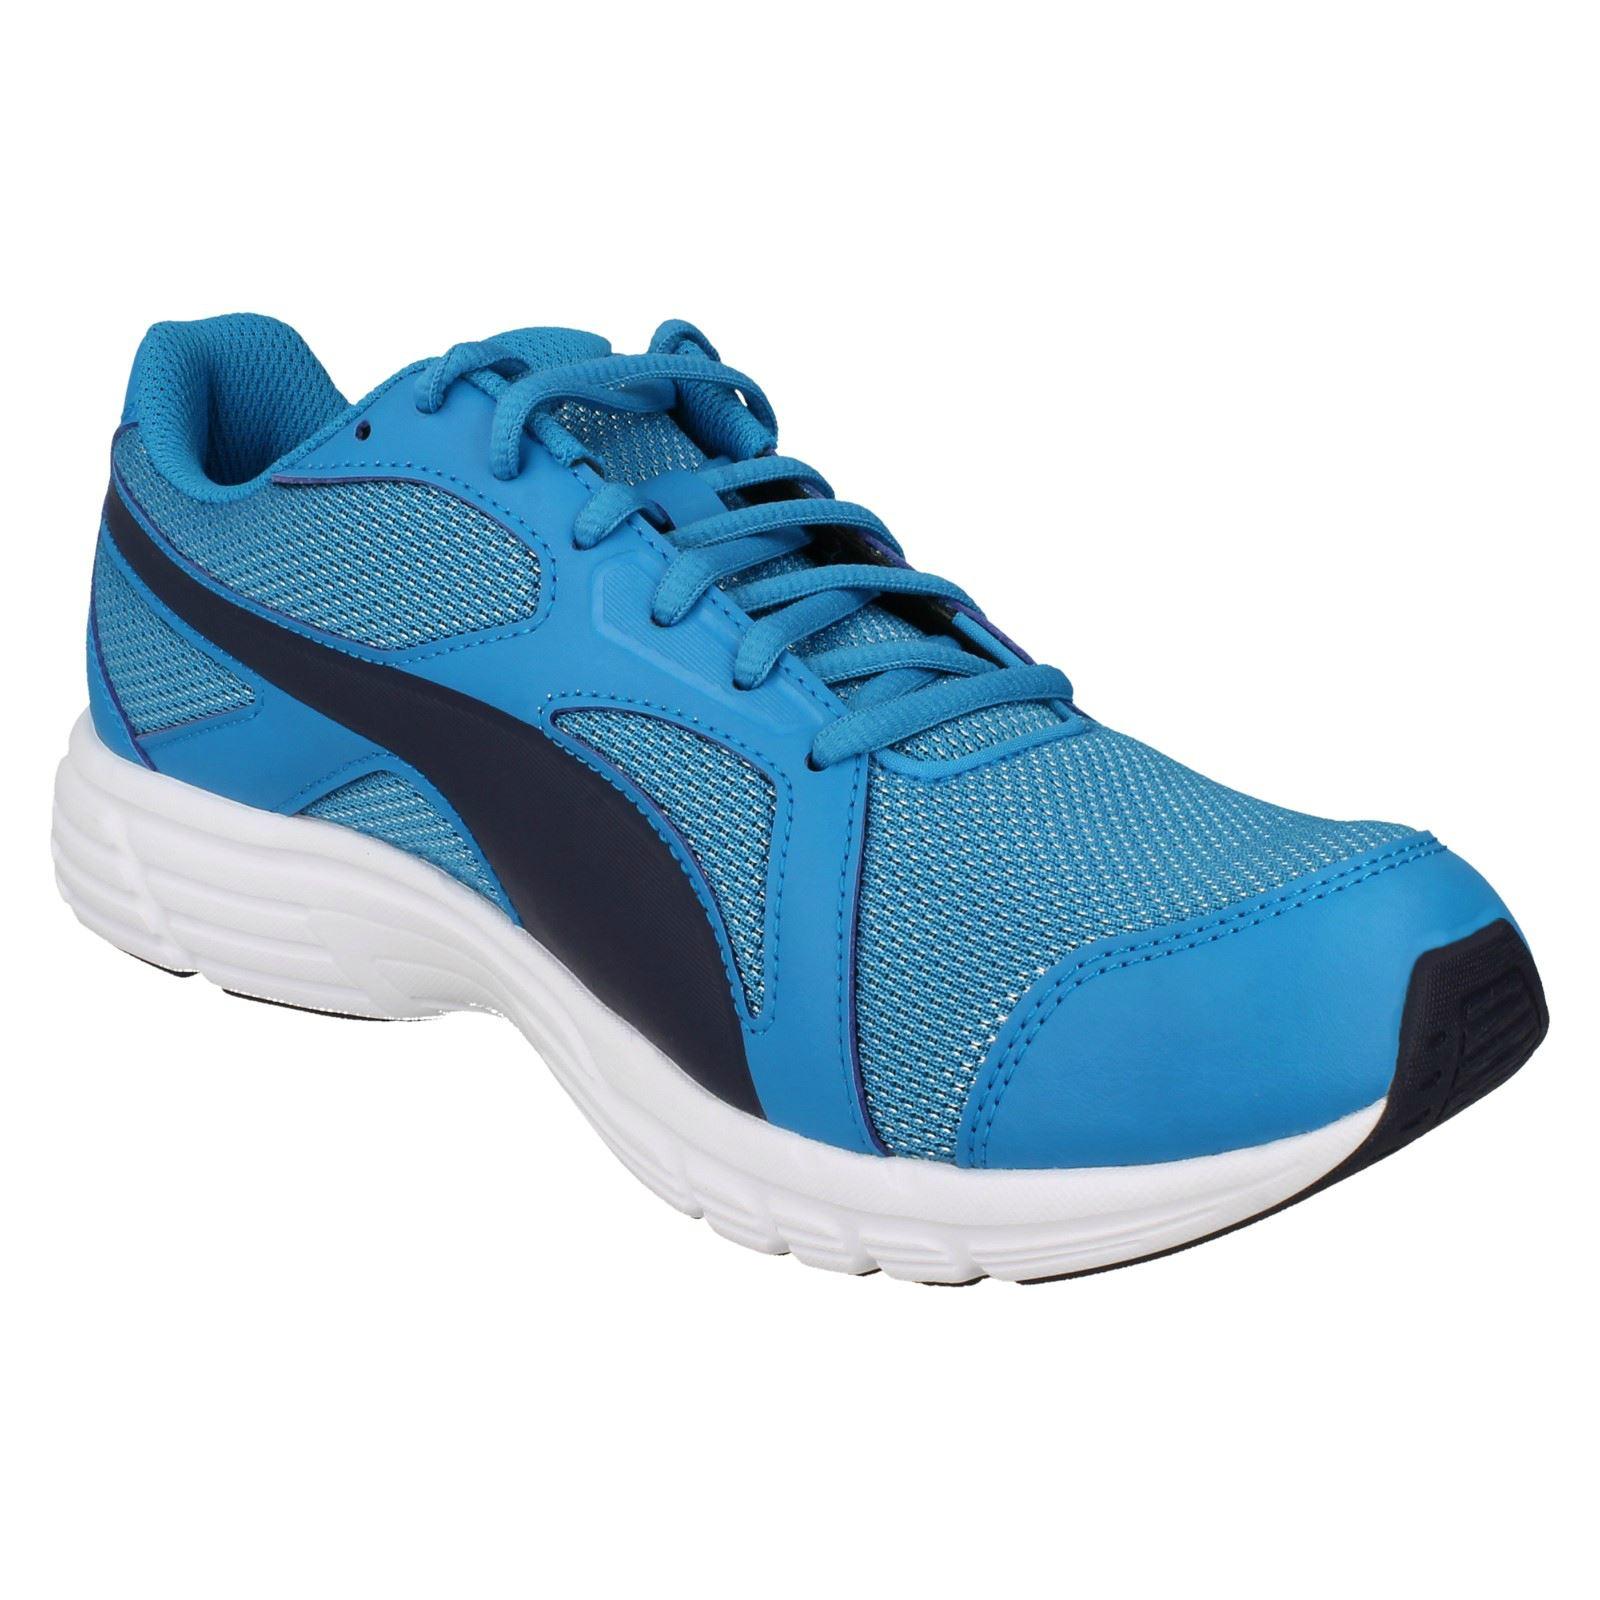 deporte Puma Atomic Blue blue mujer de V4 Up Axis para Zapatillas peacoat Lace 360581 Mesh ac5WnB